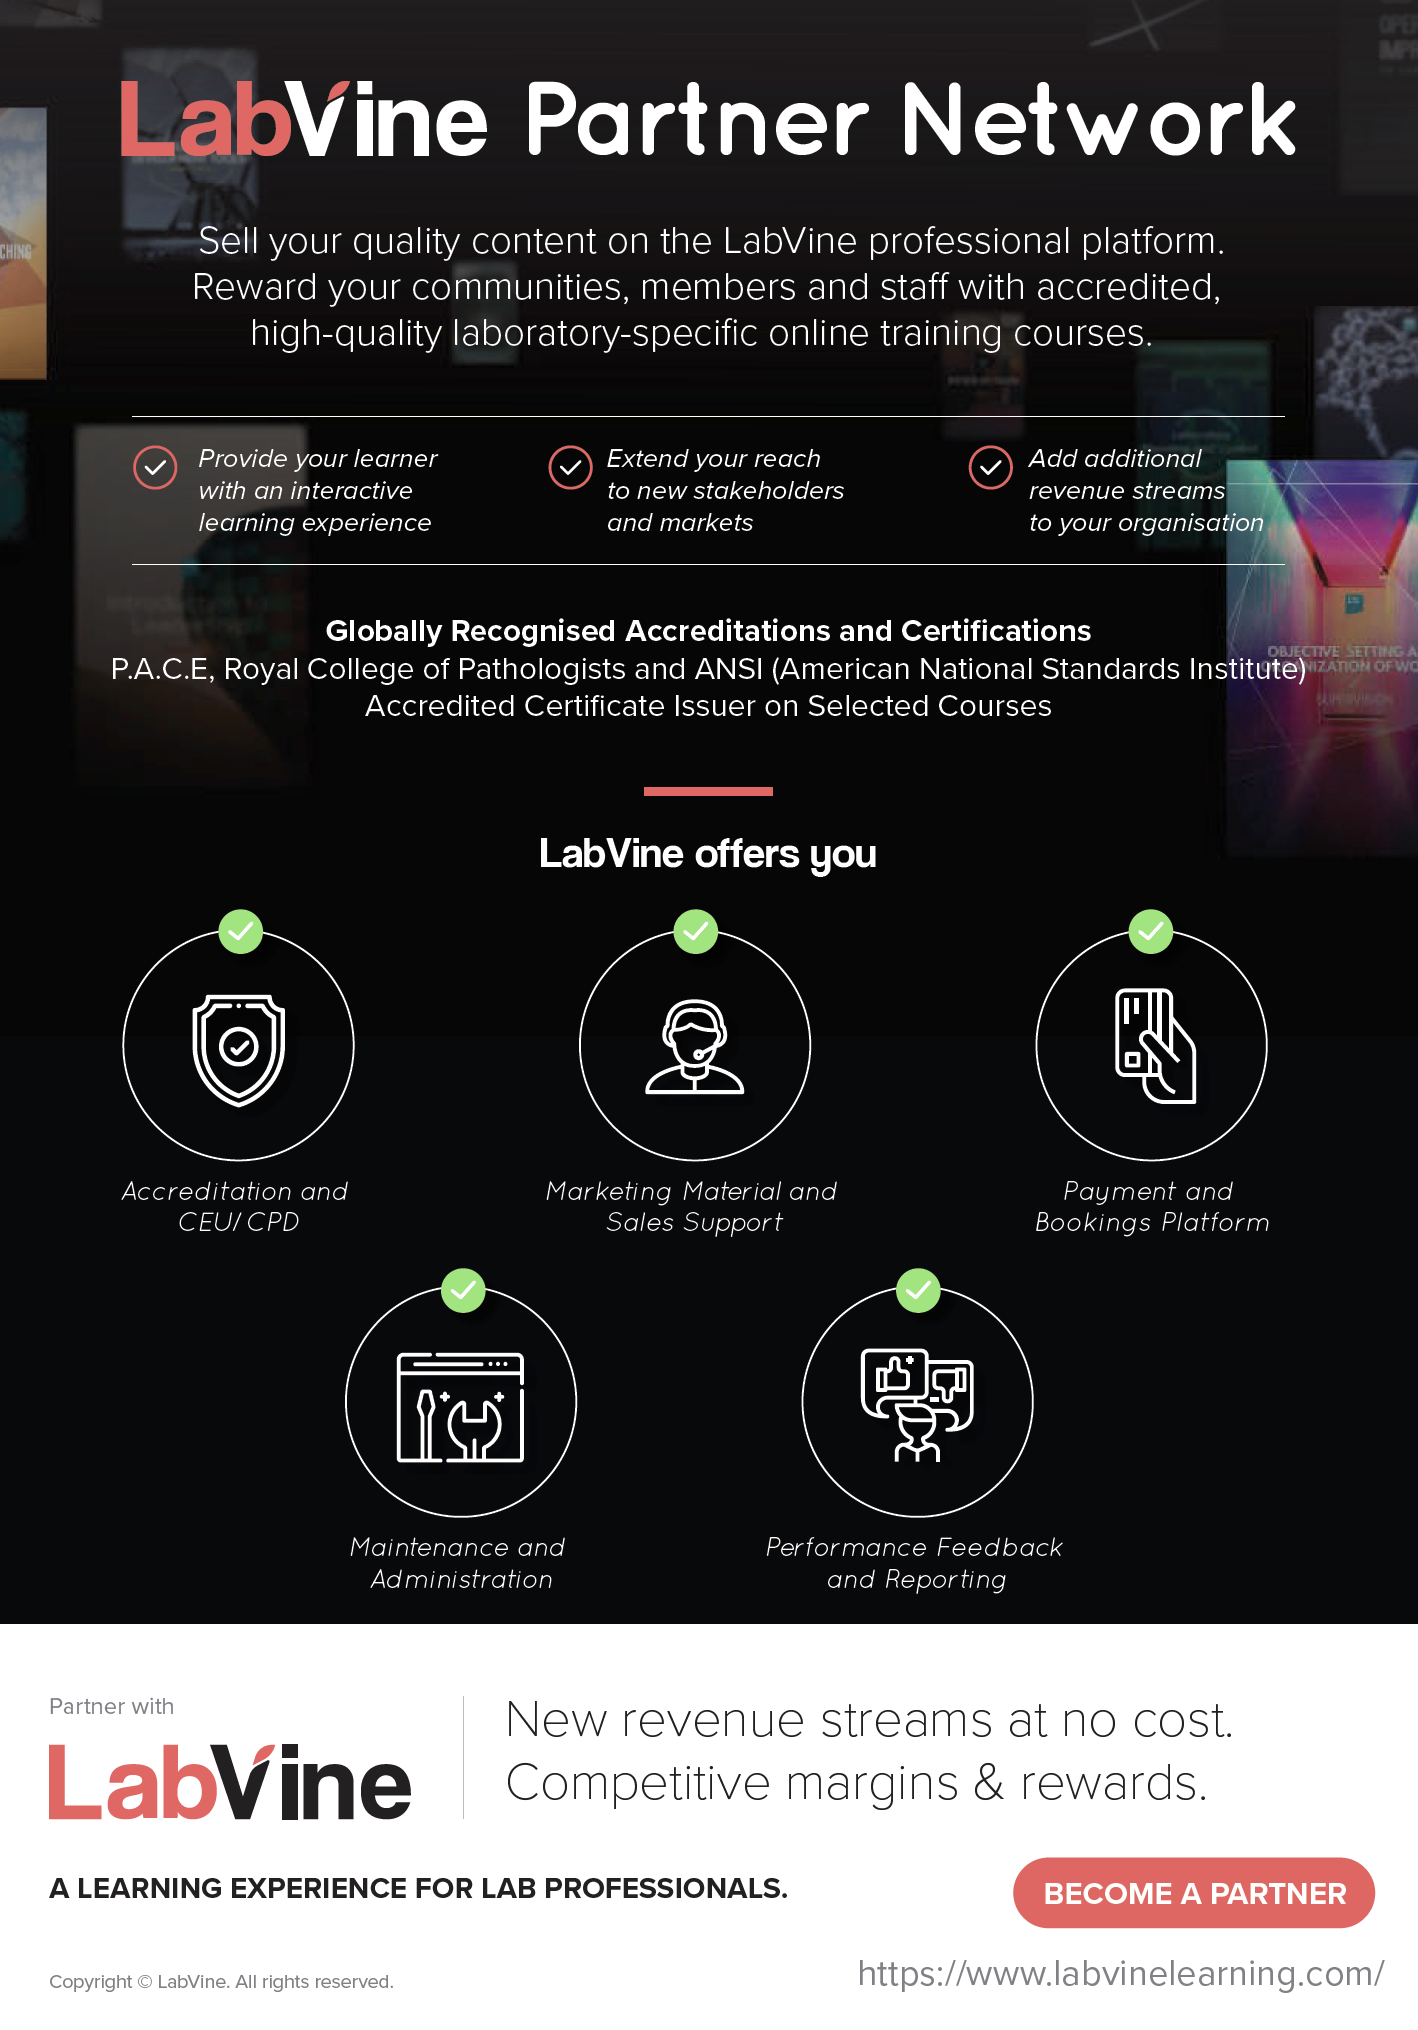 LabVine Partner Network